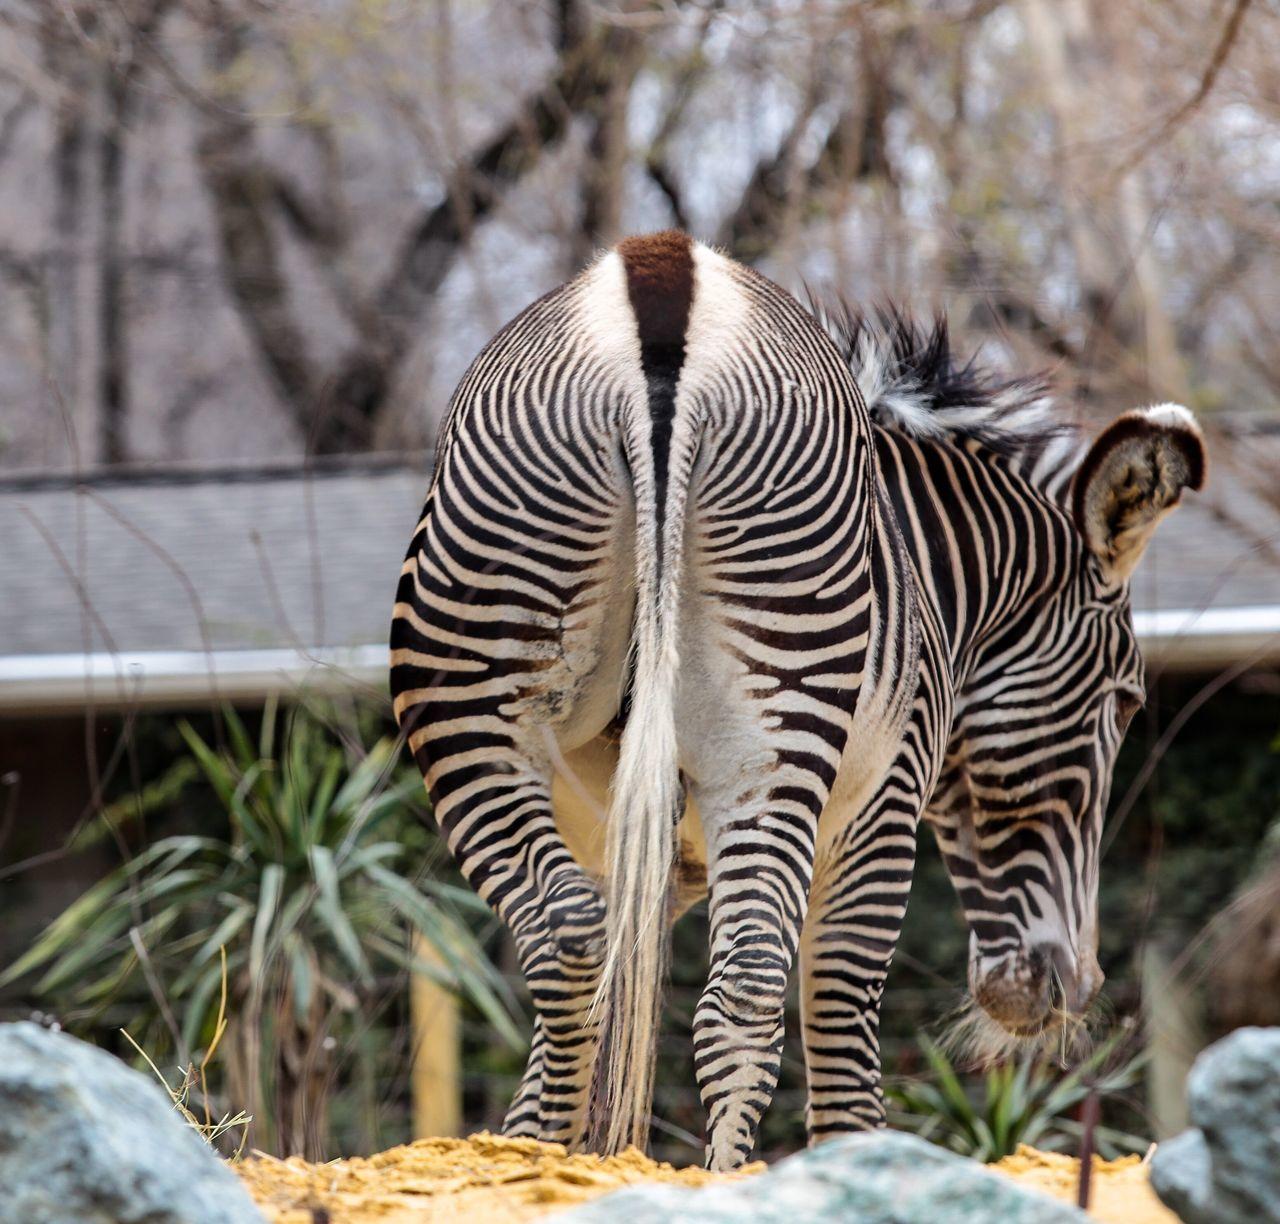 Striped Animals In The Wild Animal Themes Zebra One Animal Animal Wildlife Mammal No People Outdoors Nature Day JGLowe